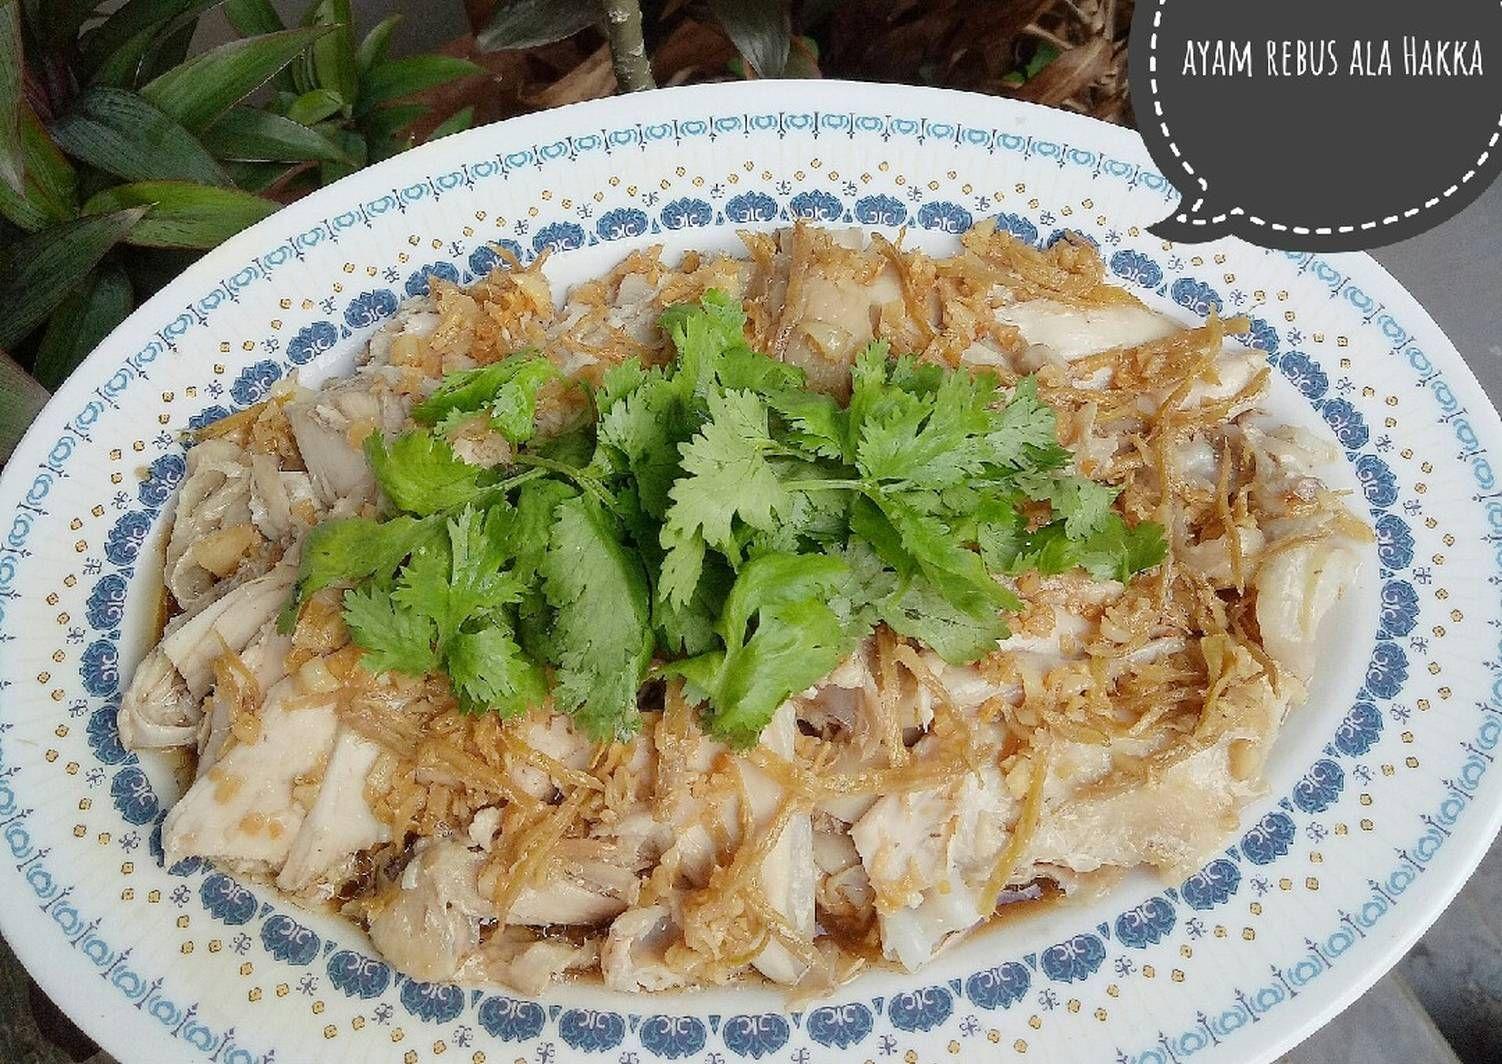 Resep Hainan Chicken Phak Cam Kee Ayam Rebus Ala Hakka Oleh Finny Puspitasari Muwarman Recipe Chicken Recipes Recipes Hainan Chicken